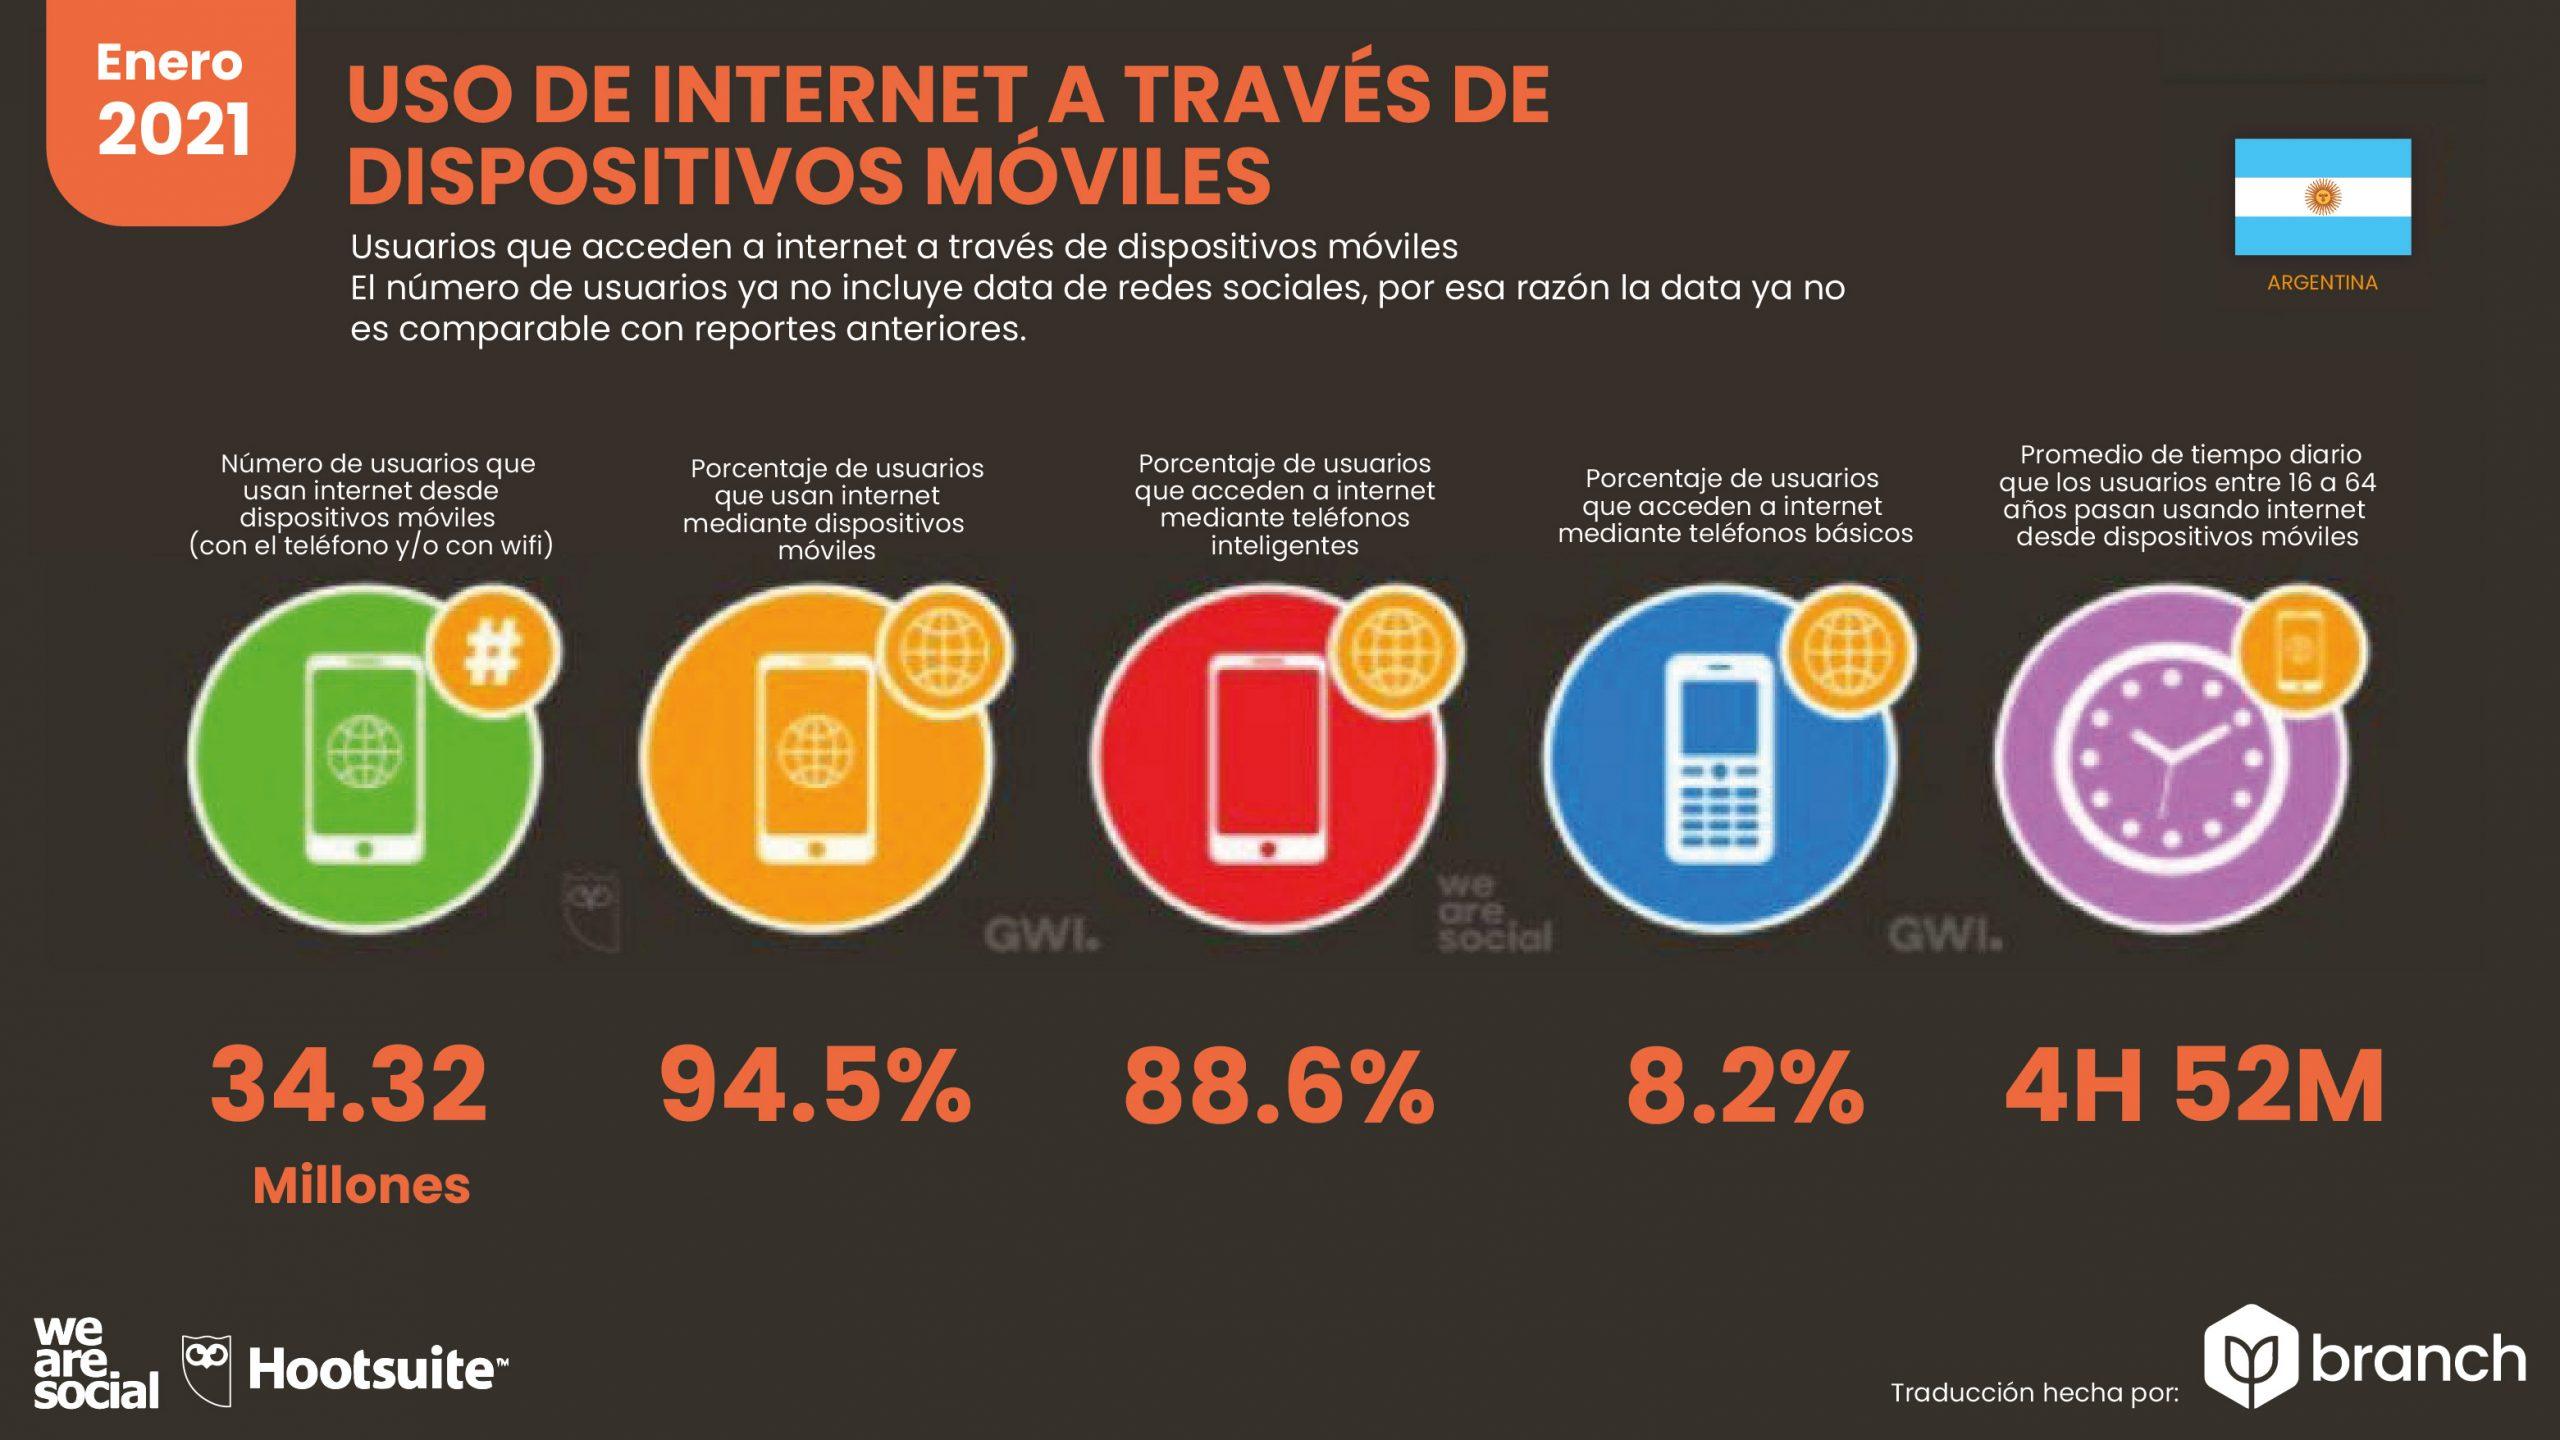 grafico-uso-de-internet-a-traves-de-dispositivo-argentina-2020-2021